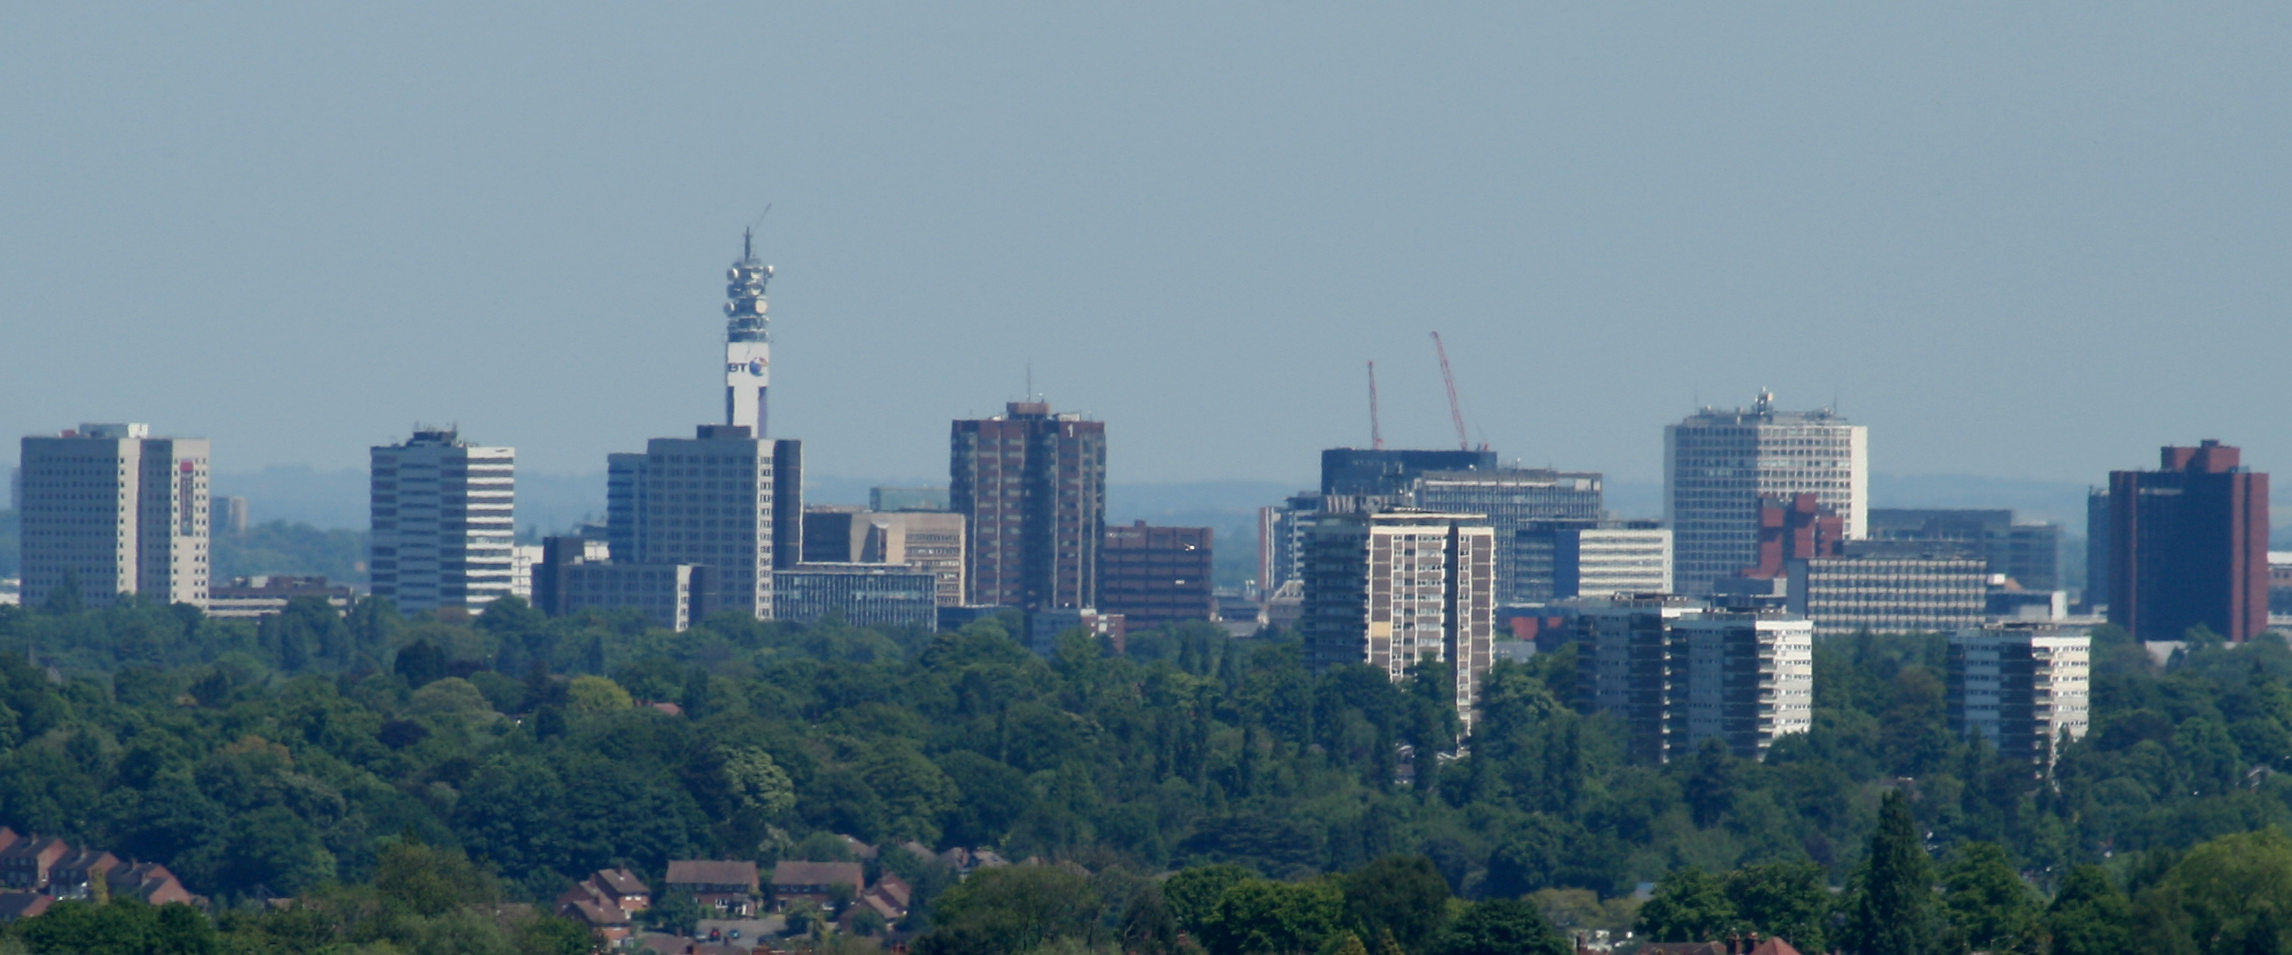 File:Birmingham-Skyline-from-the-West.jpg - Wikimedia Commons